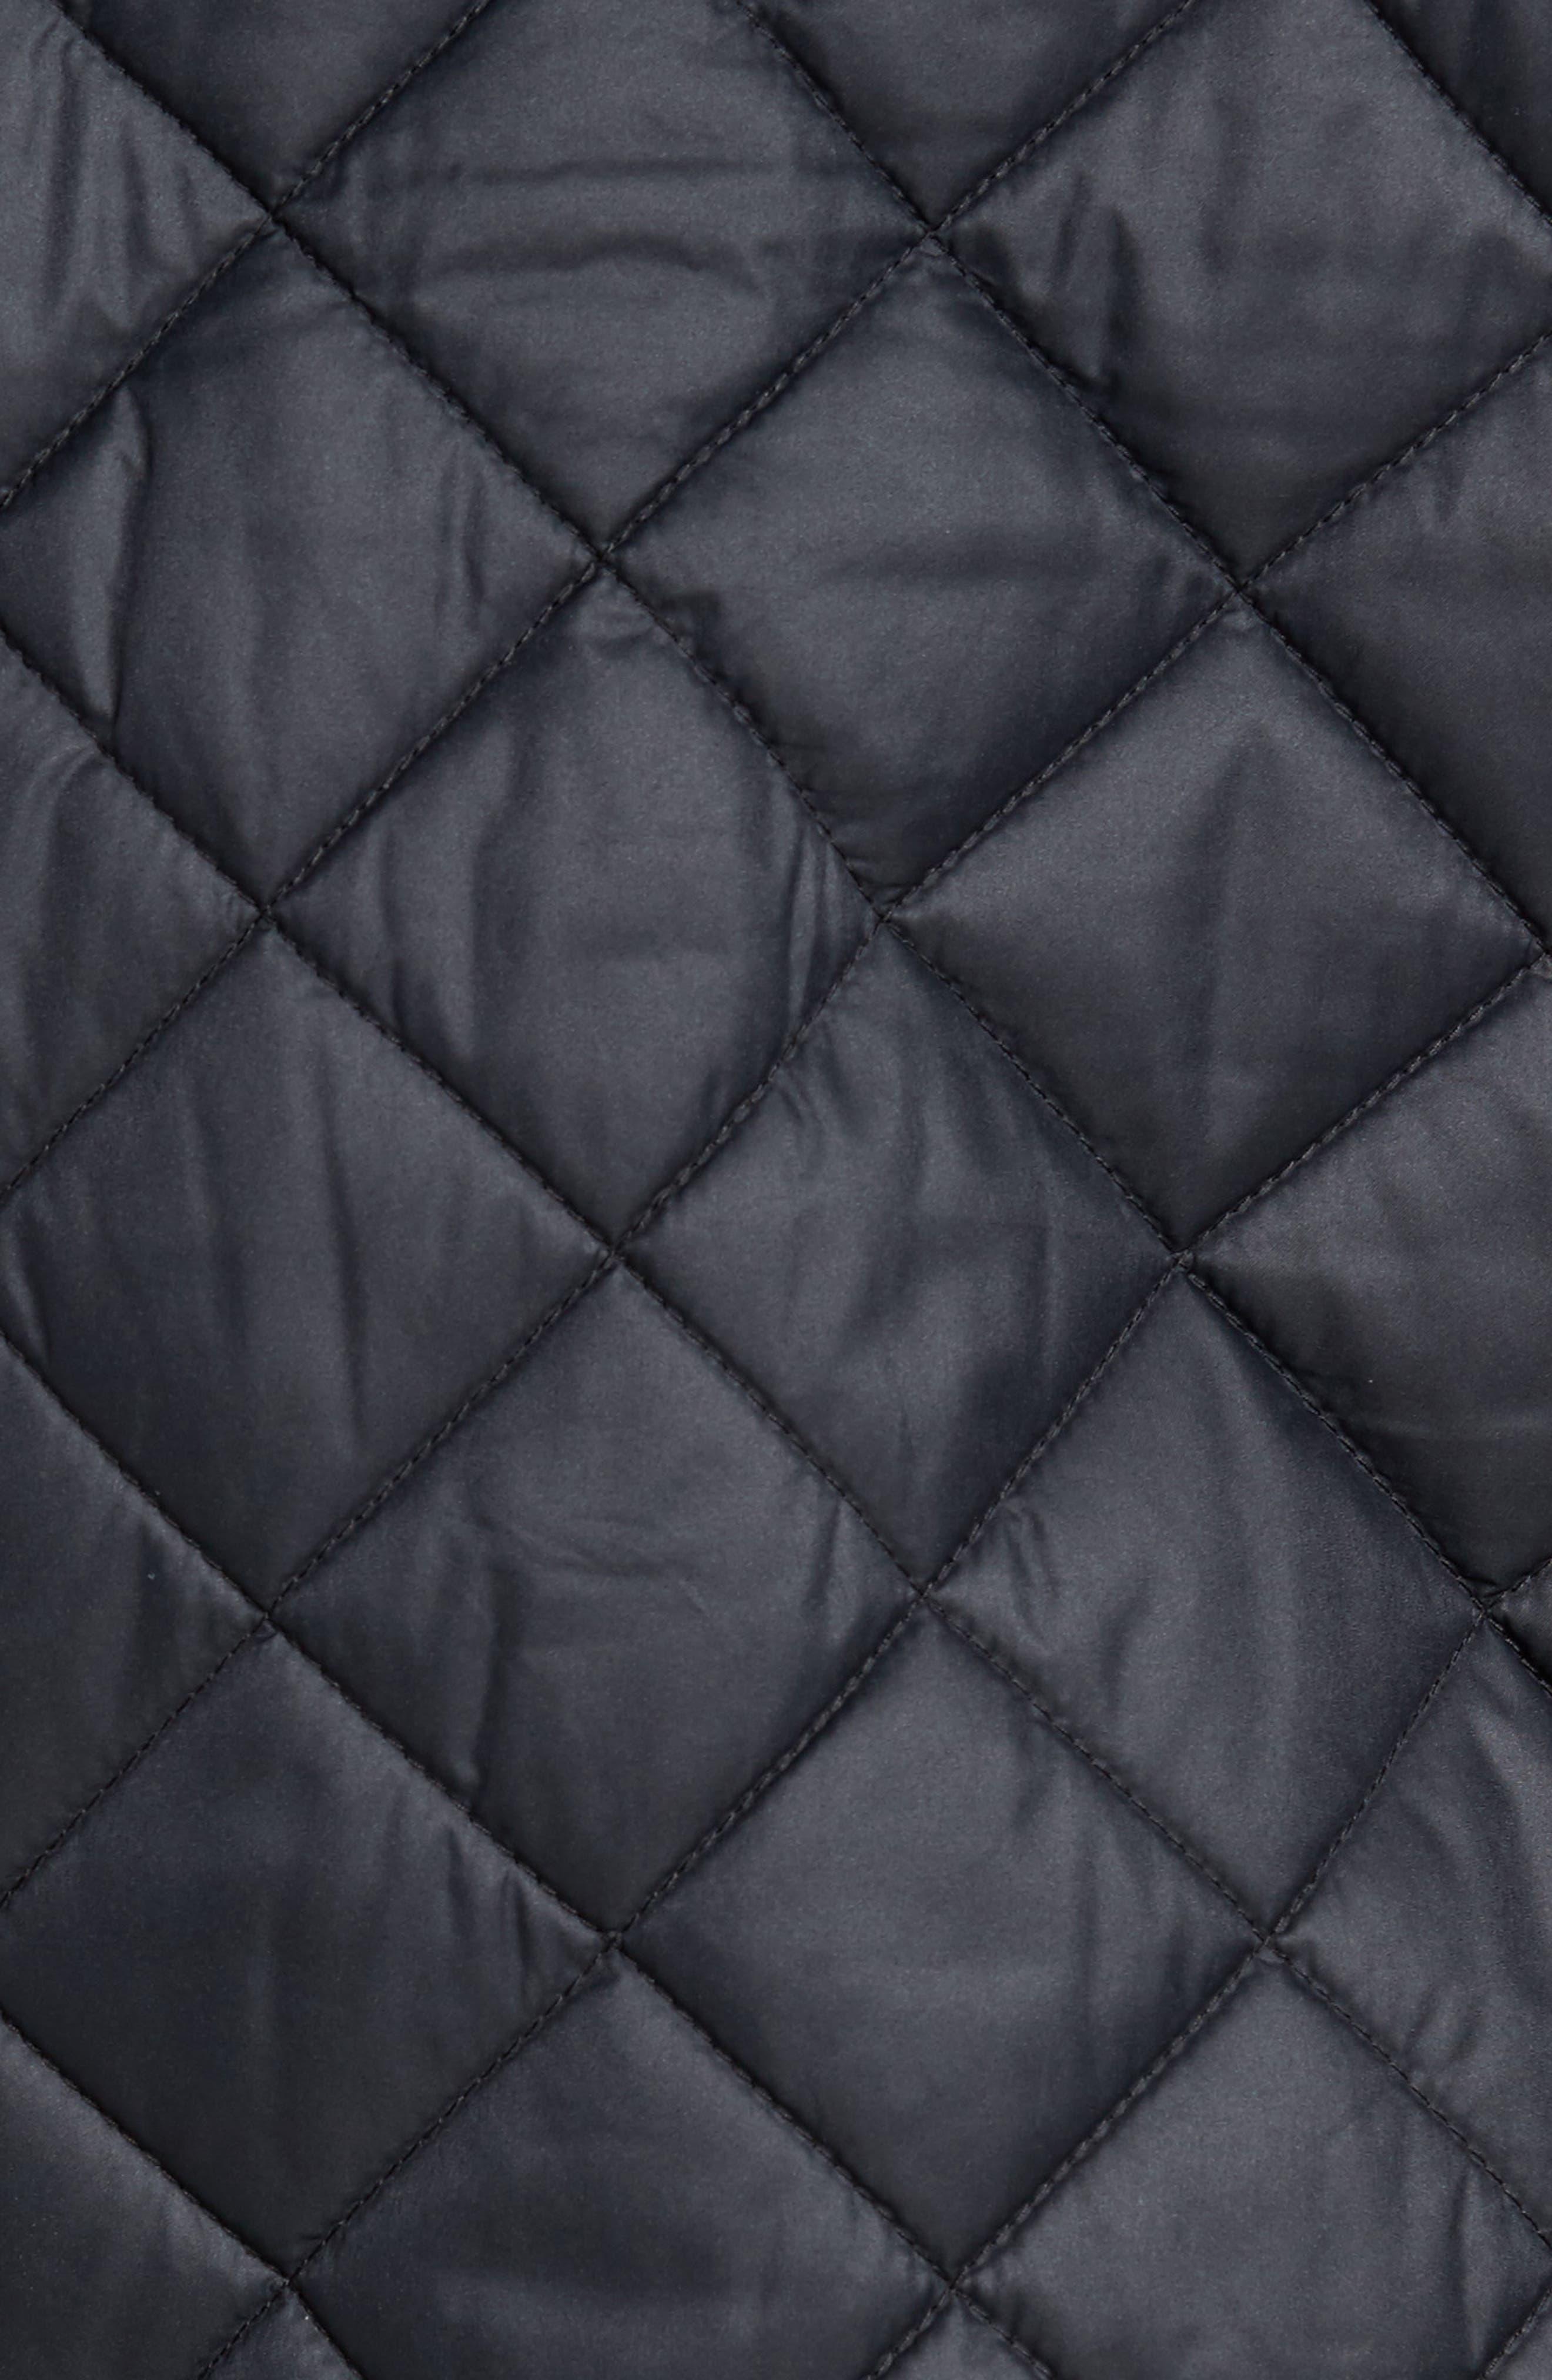 Essex Quilted Vest,                             Alternate thumbnail 6, color,                             BLACK / BLACK